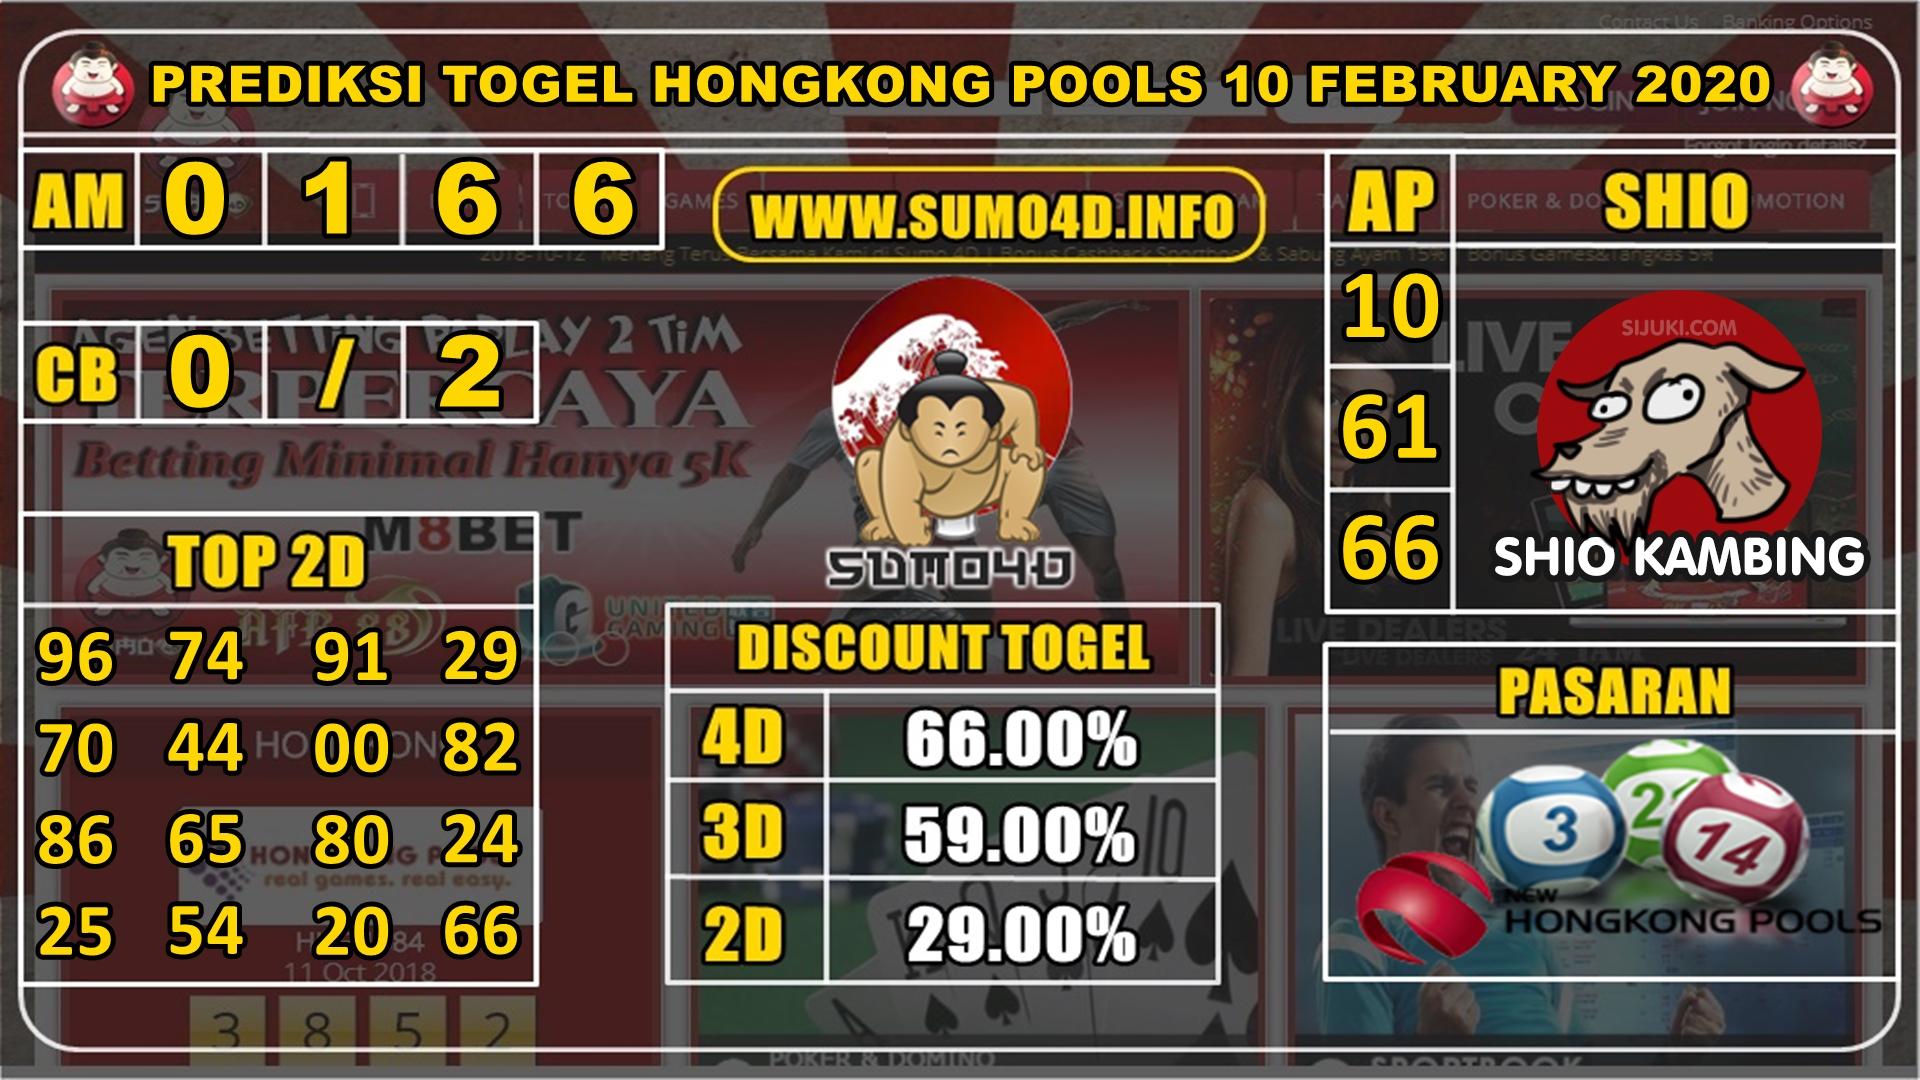 PREDIKSI TOGEL HONGKONG POOLS 10 FEBRUARY 2020